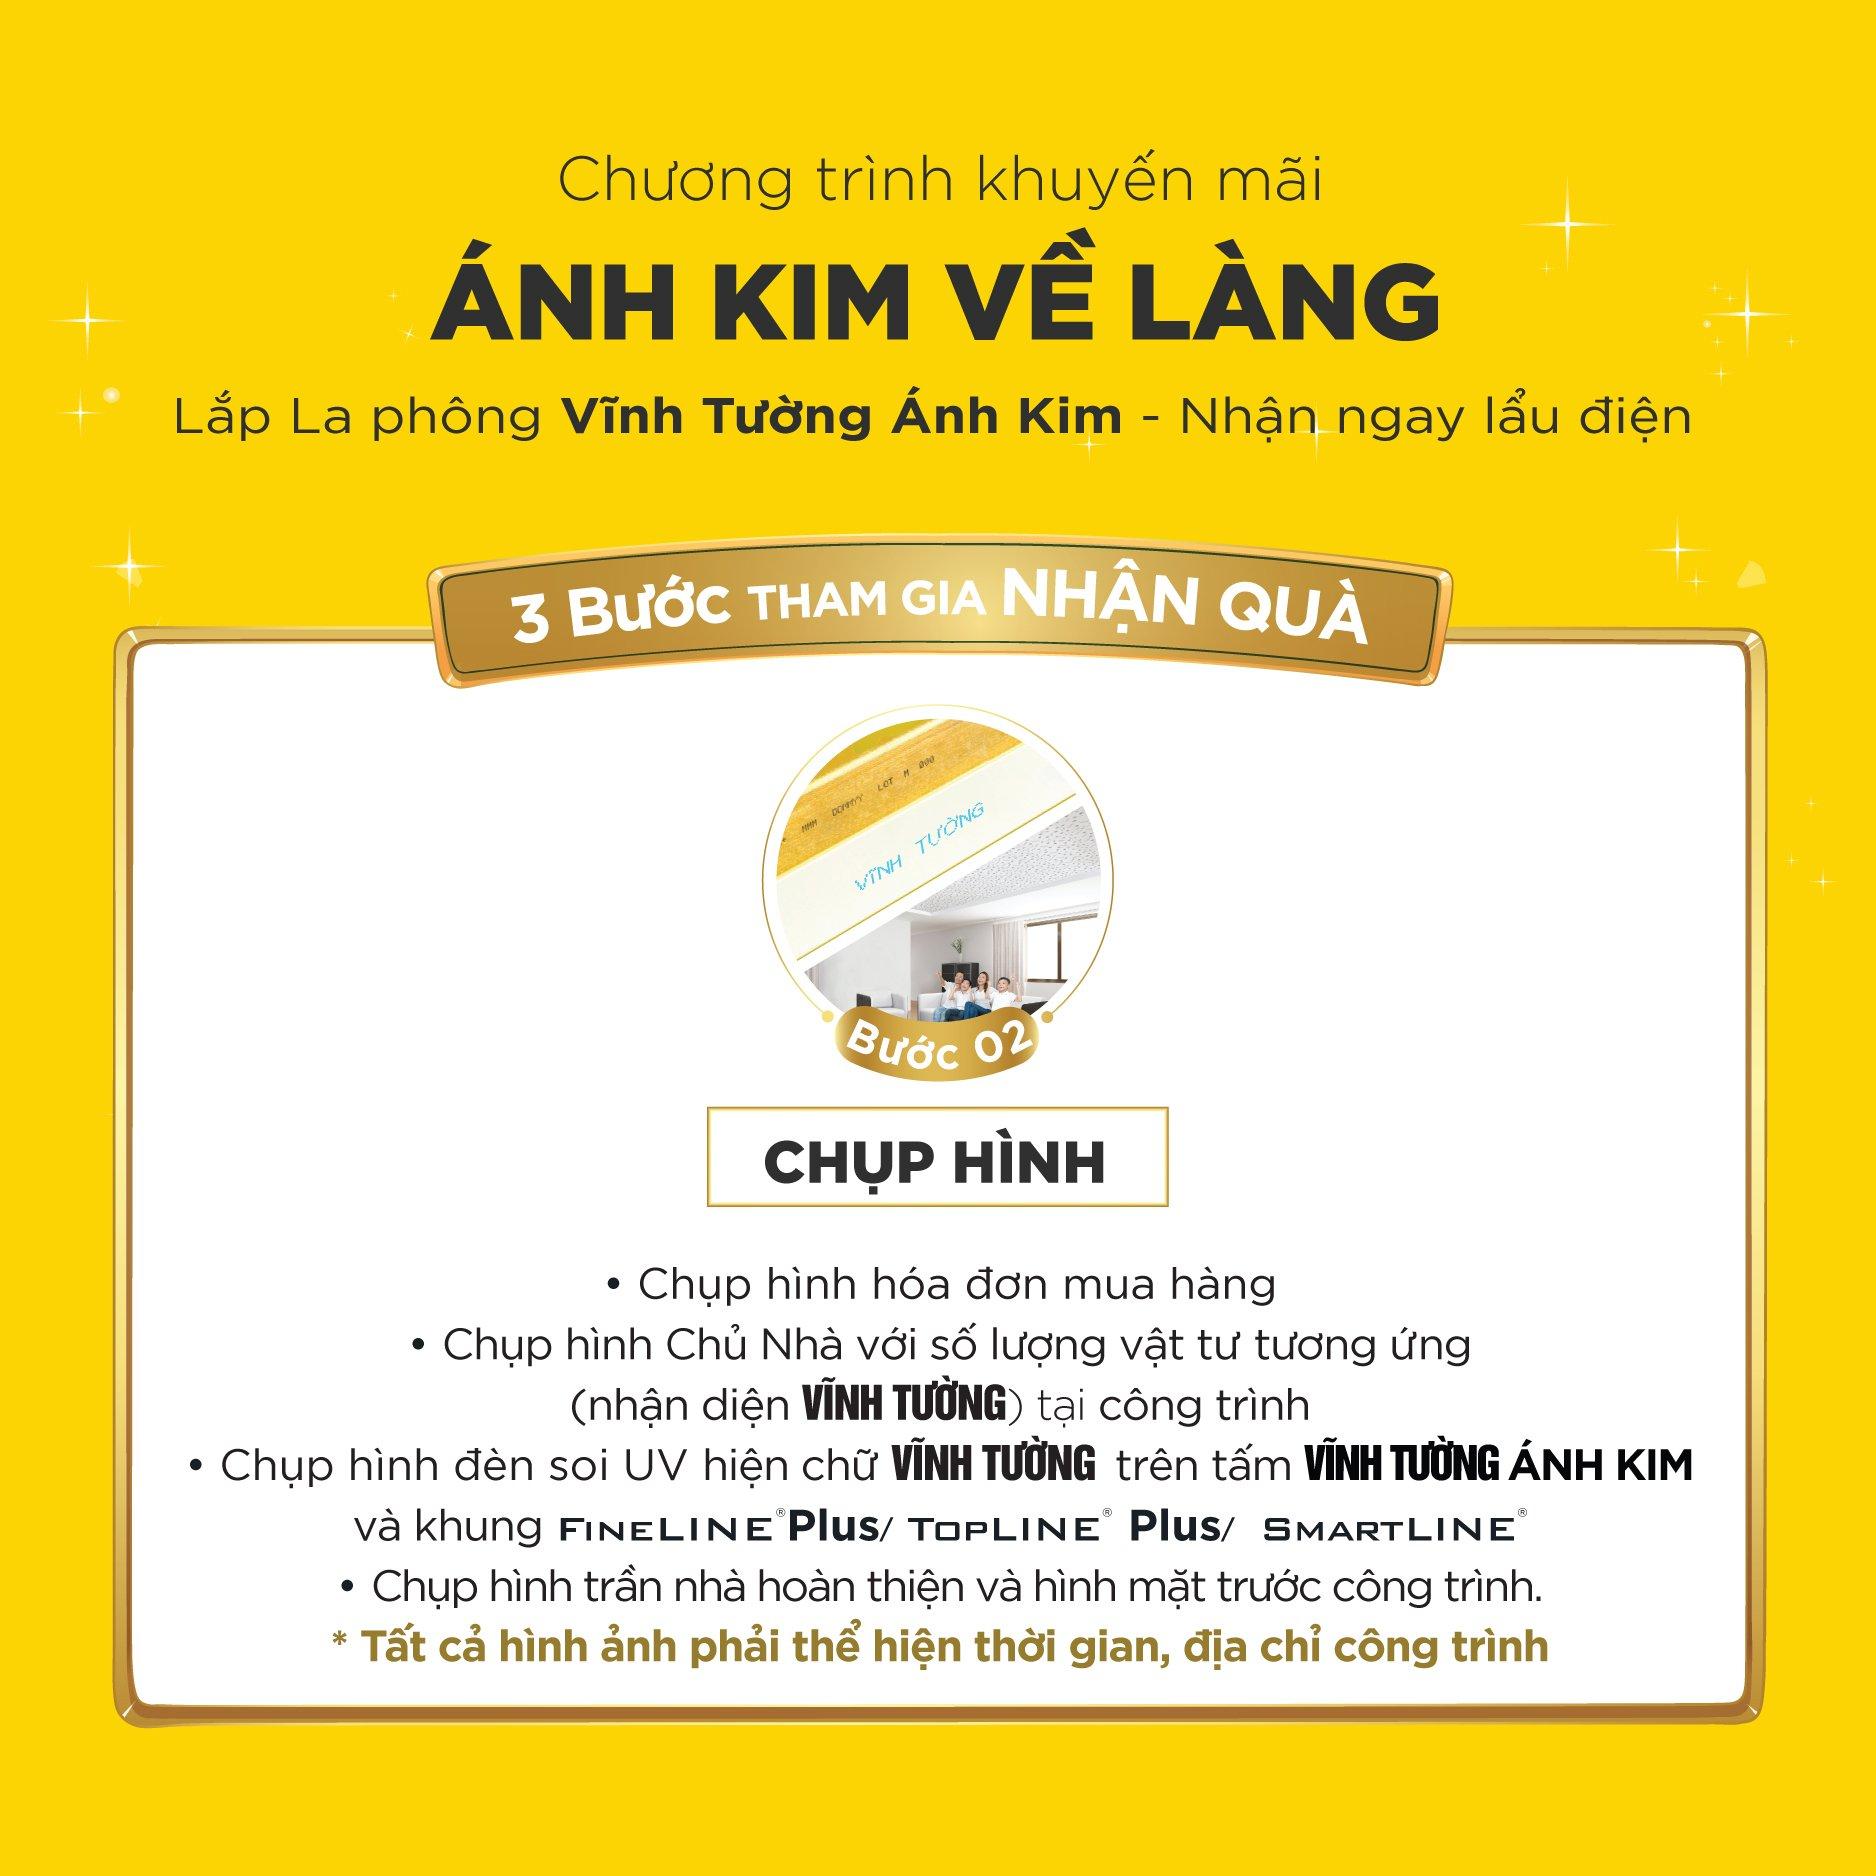 The le tham gia chuong trinh ANH KIM VE LANG